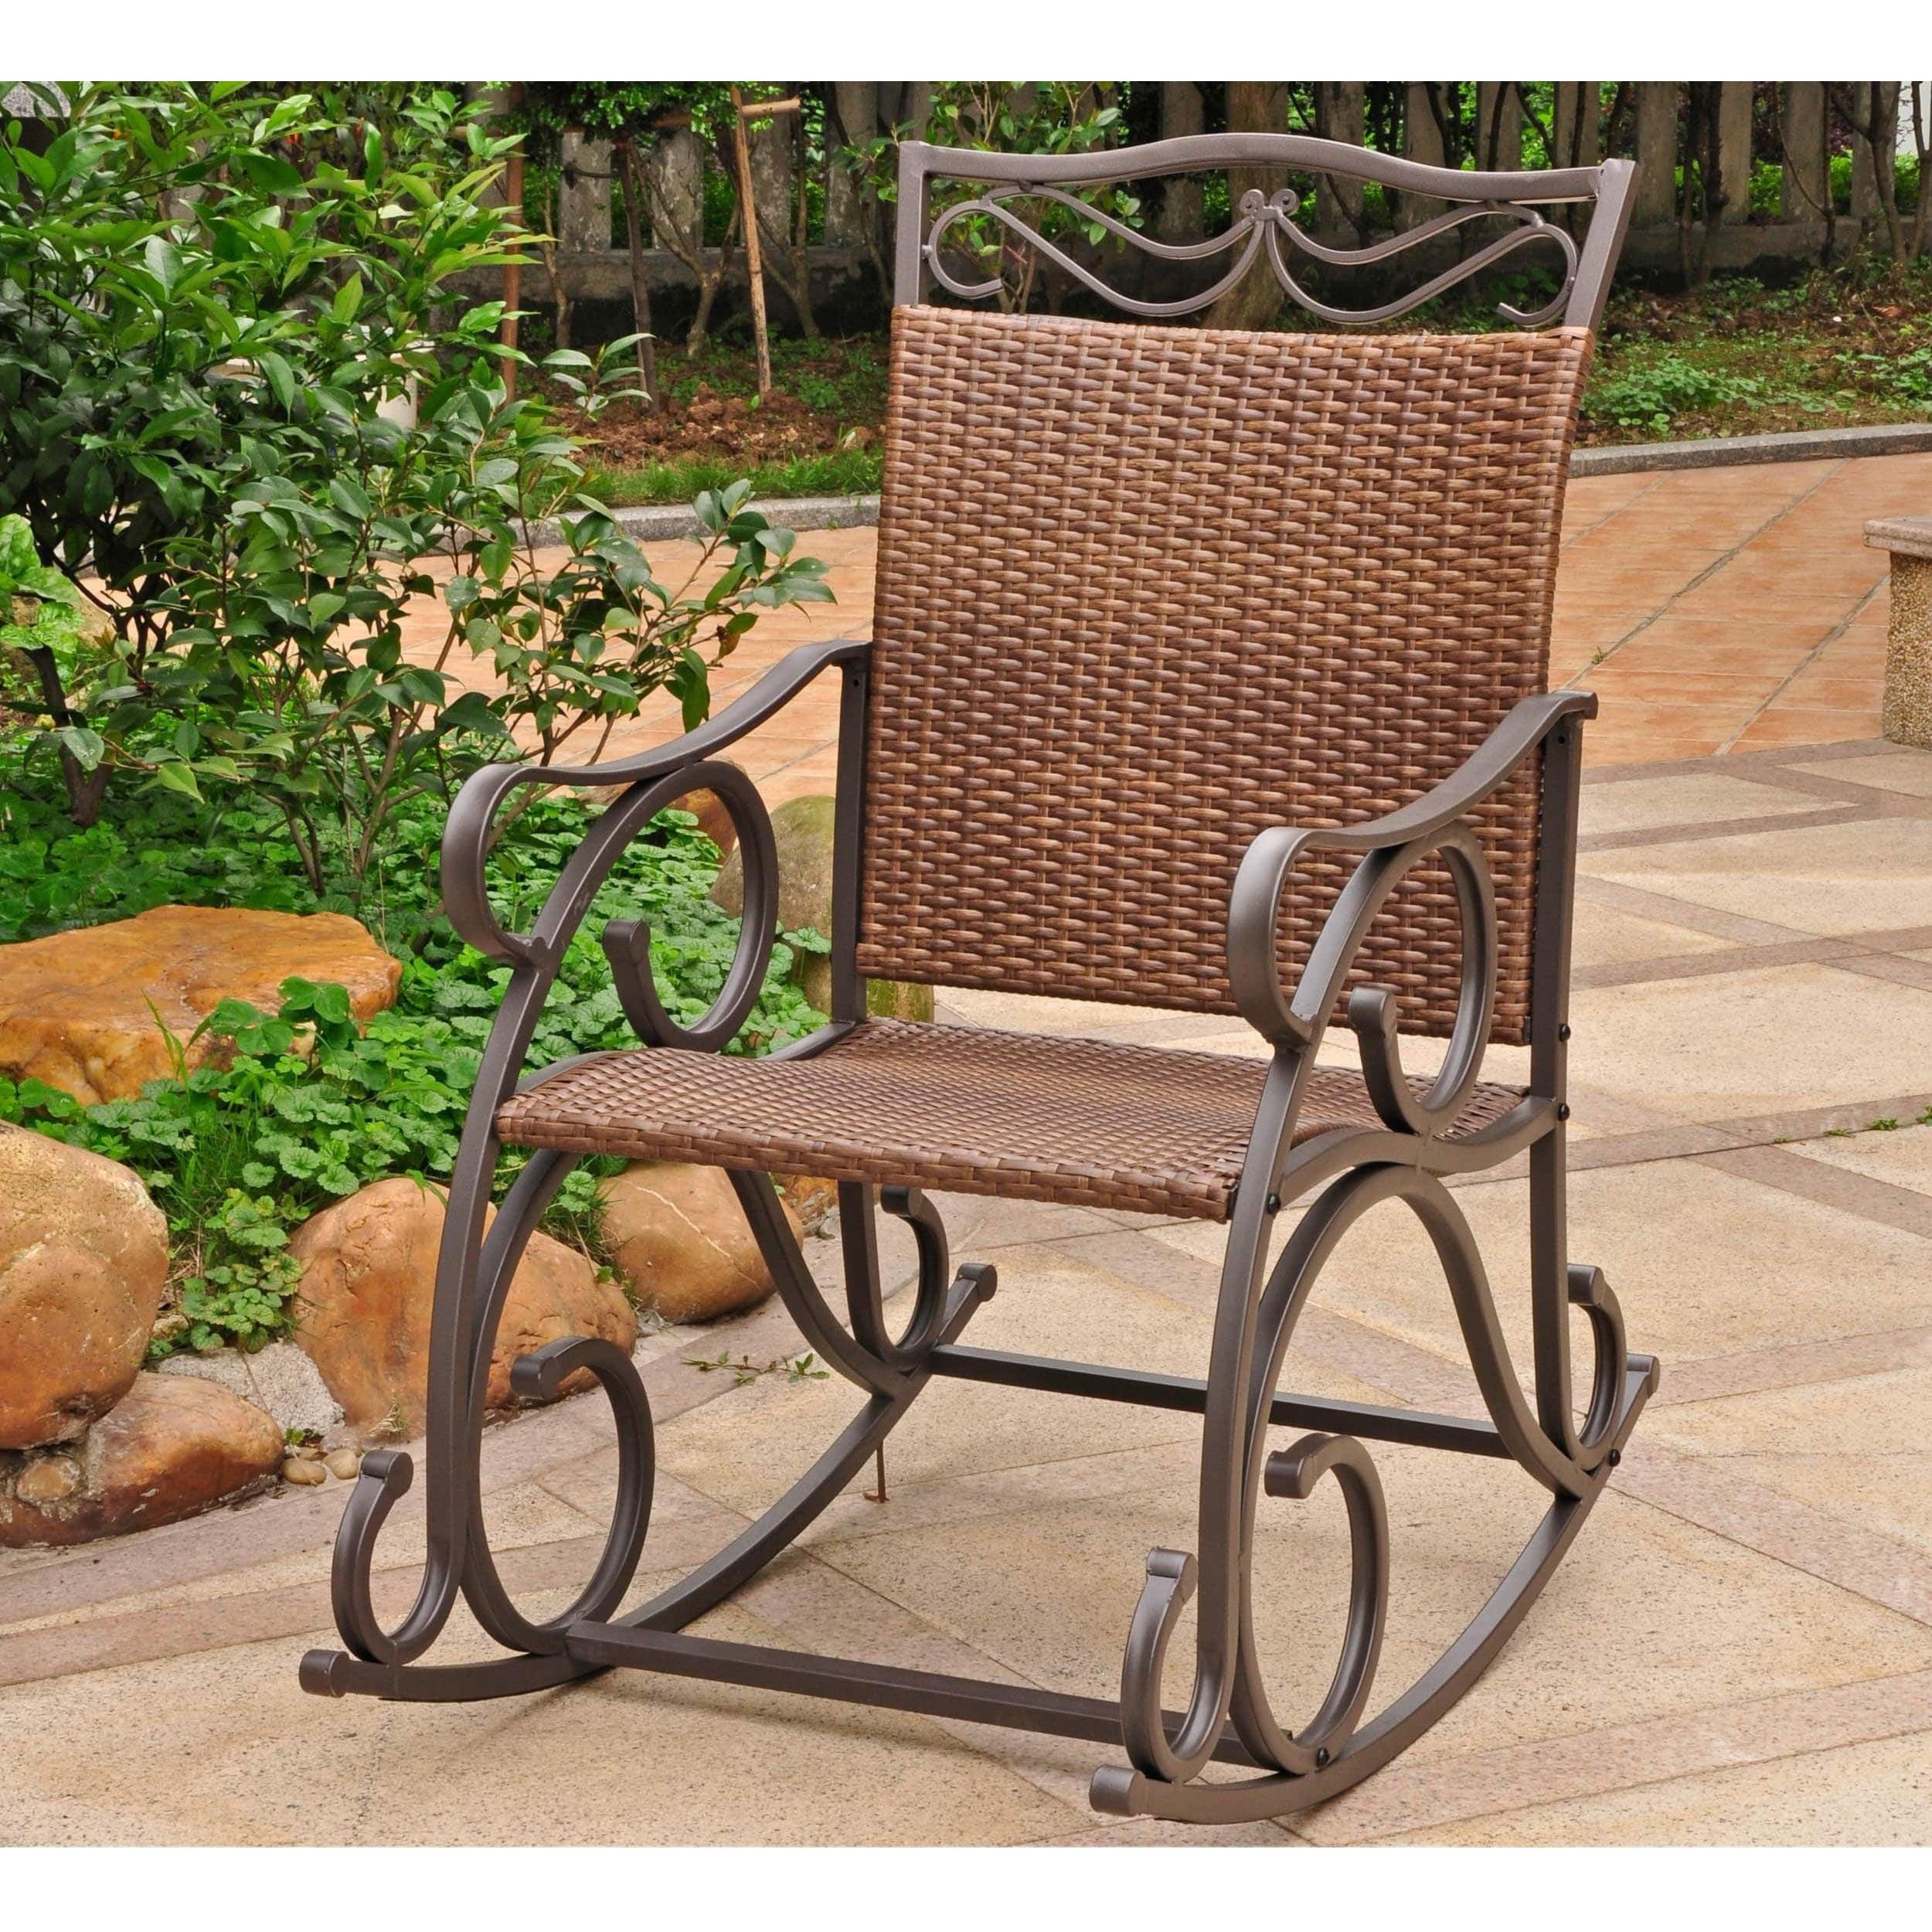 International caravan valencia resin wicker steel frame rocking chair